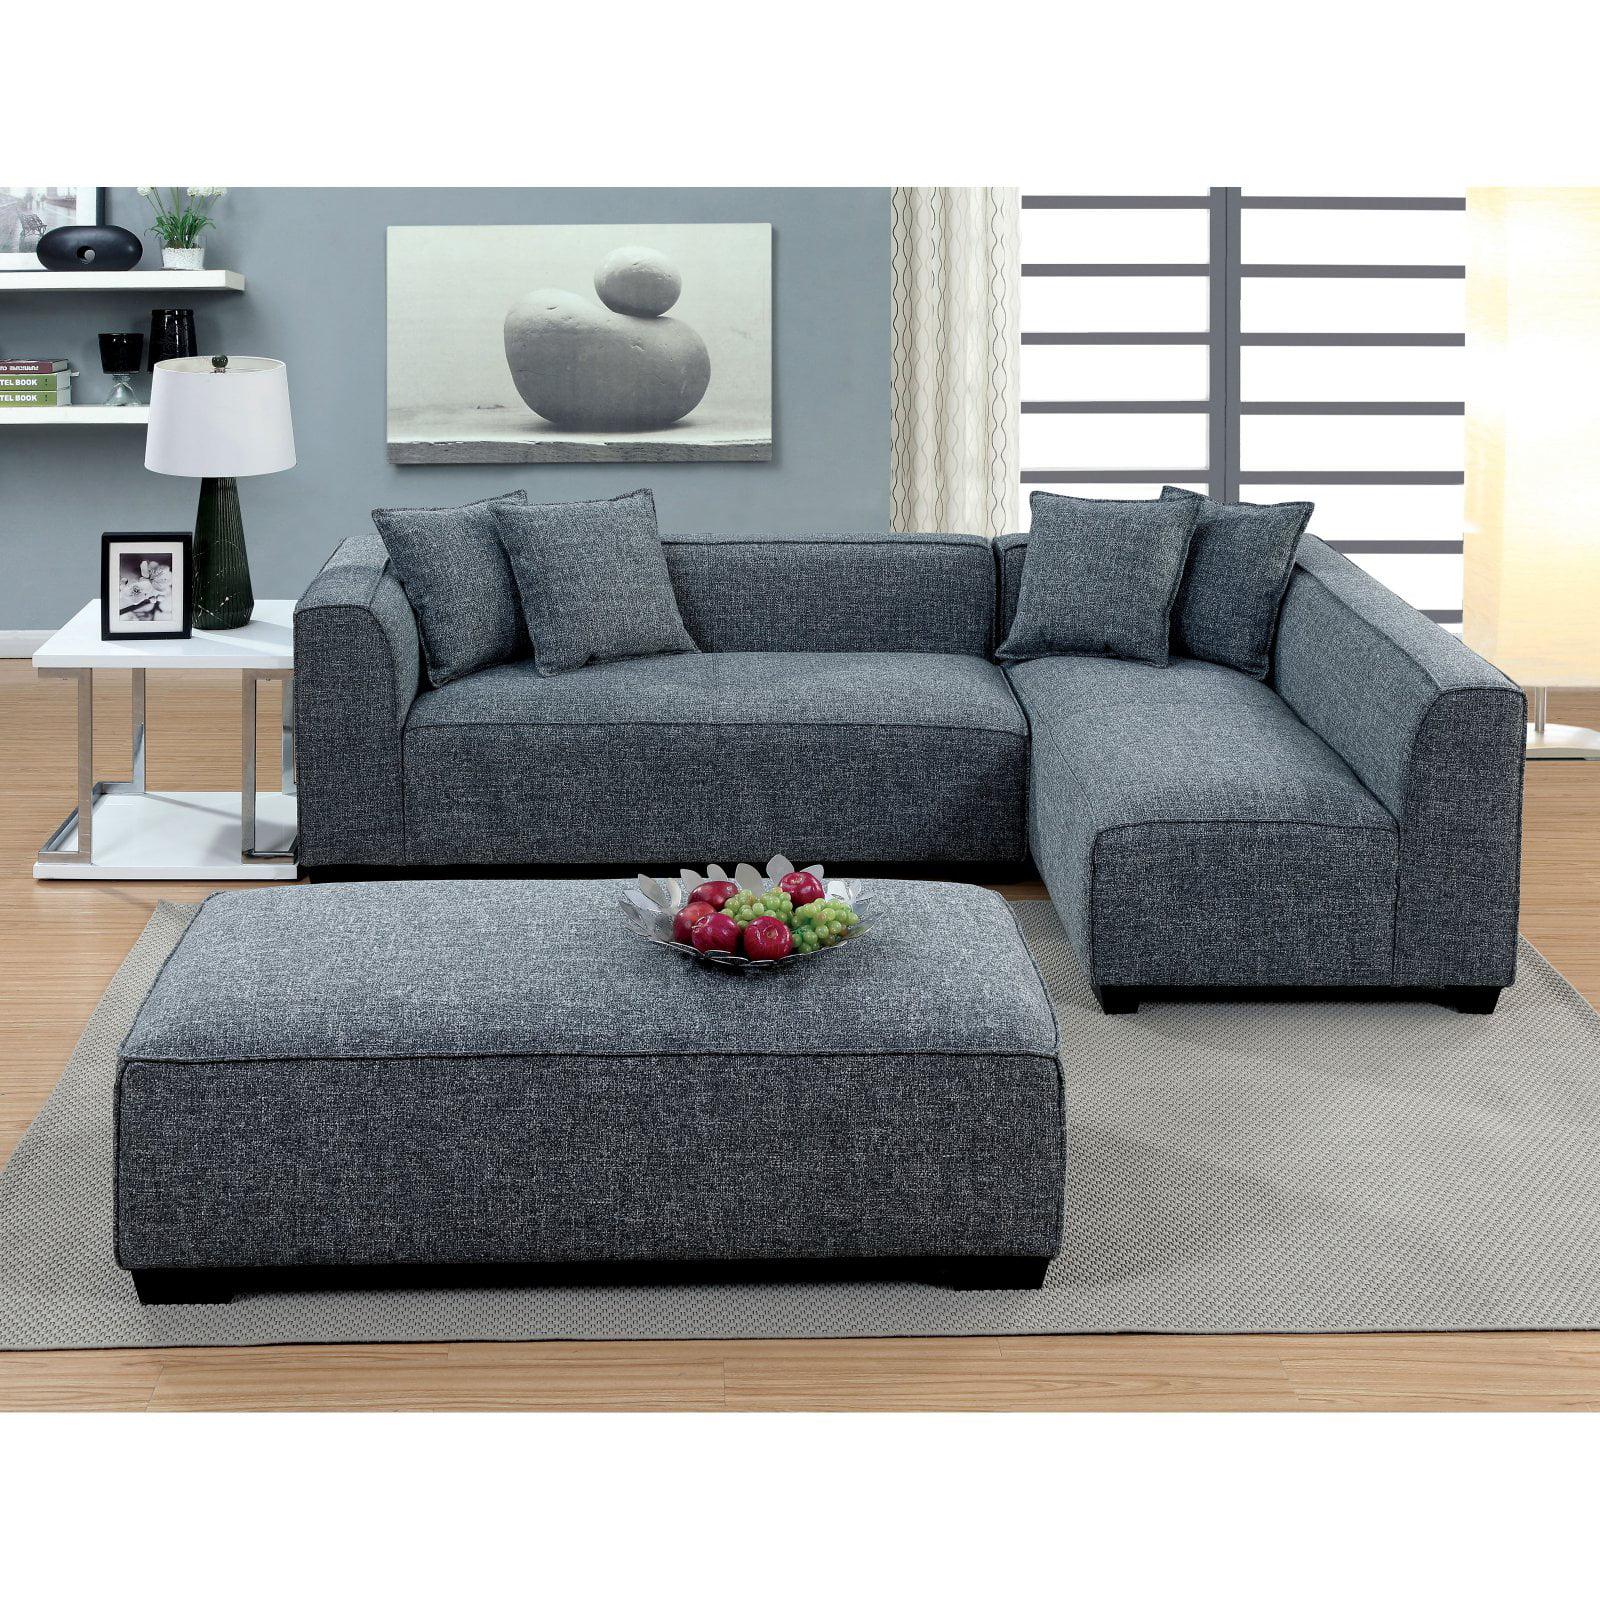 Furniture Of America Misha Contemporary